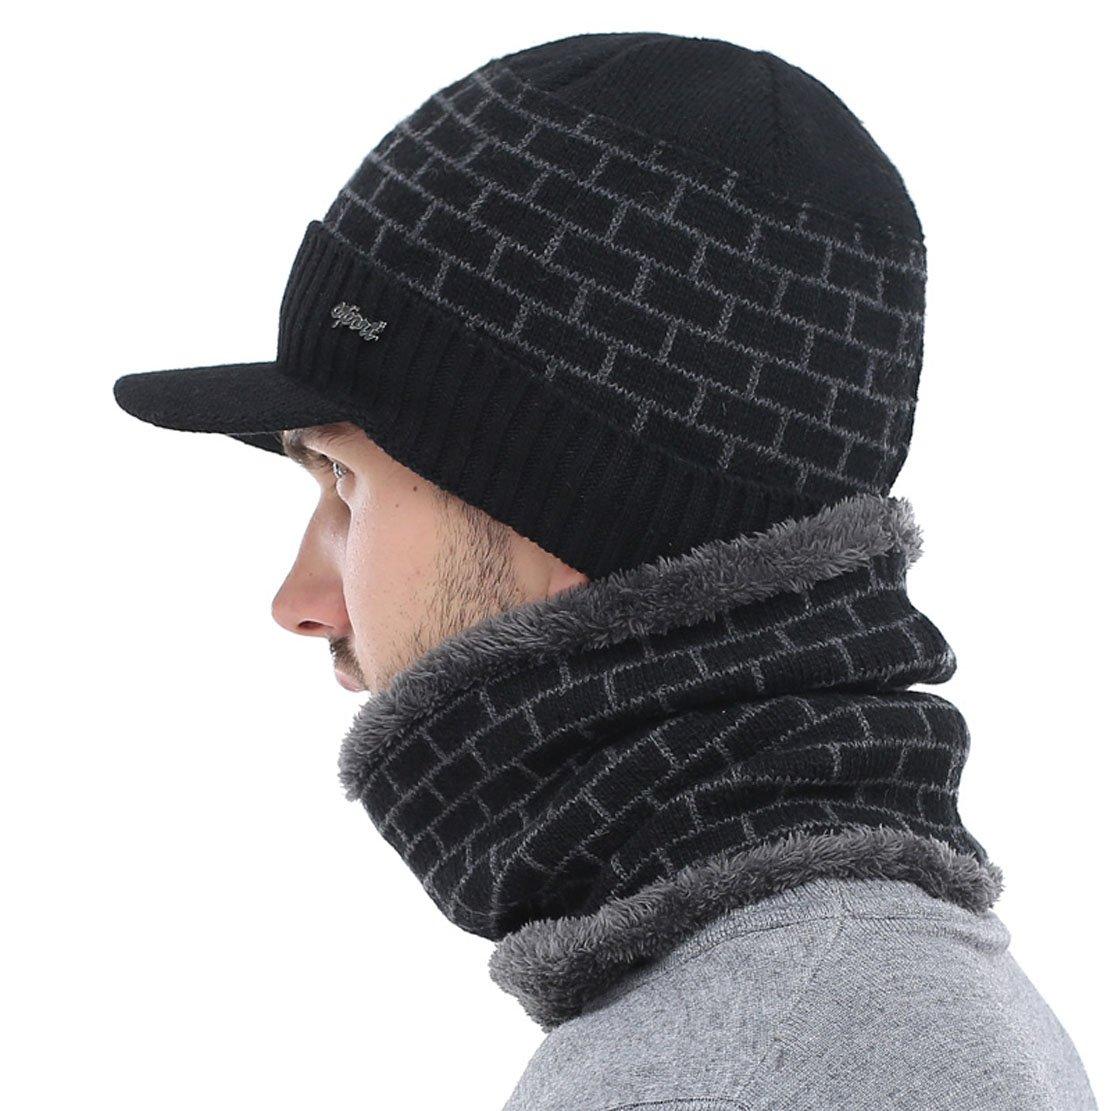 AETRUE Winter Hat Skullies Beanies Men Women Knitted Hat Scarf Winter Caps Mask Balaclava Bonnet Cap Wool Fur Beanies Hats 2018 (Dark Grey) at Amazon Mens ...